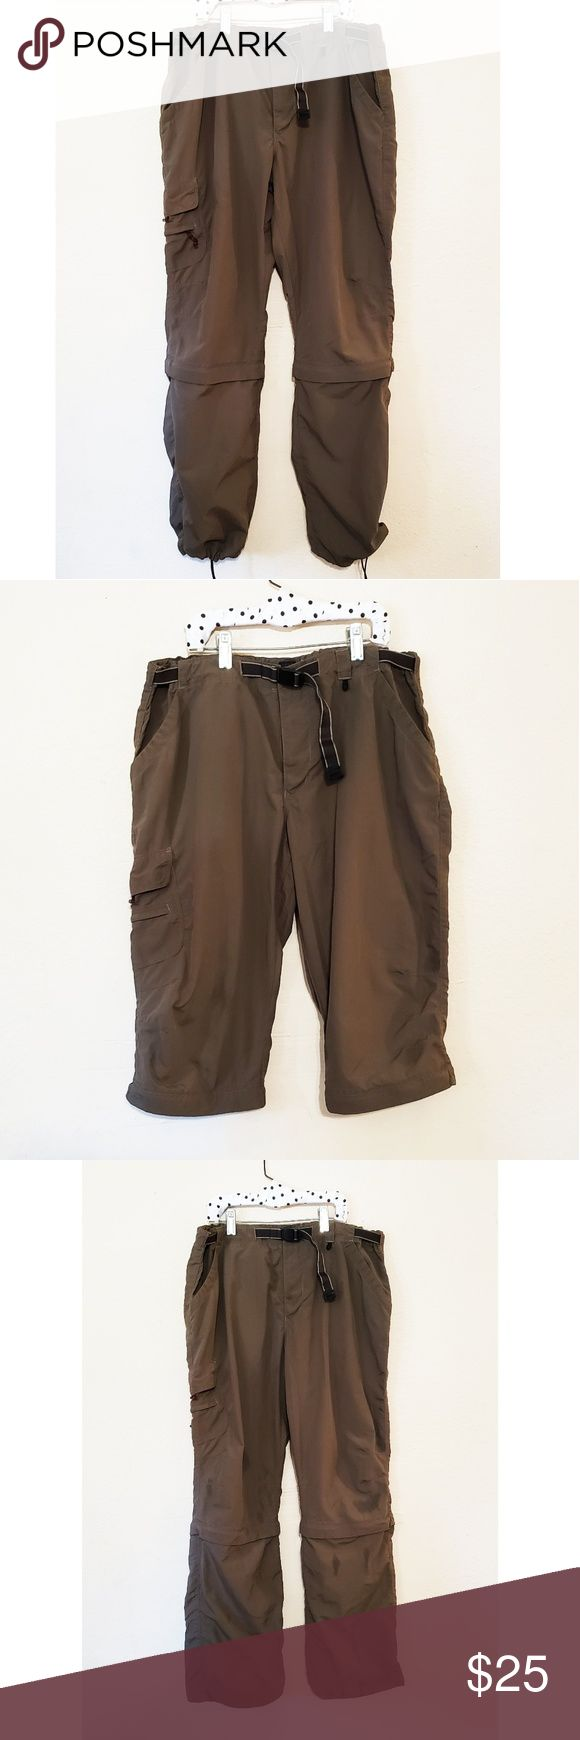 Womens petite convertible pants rei — photo 5